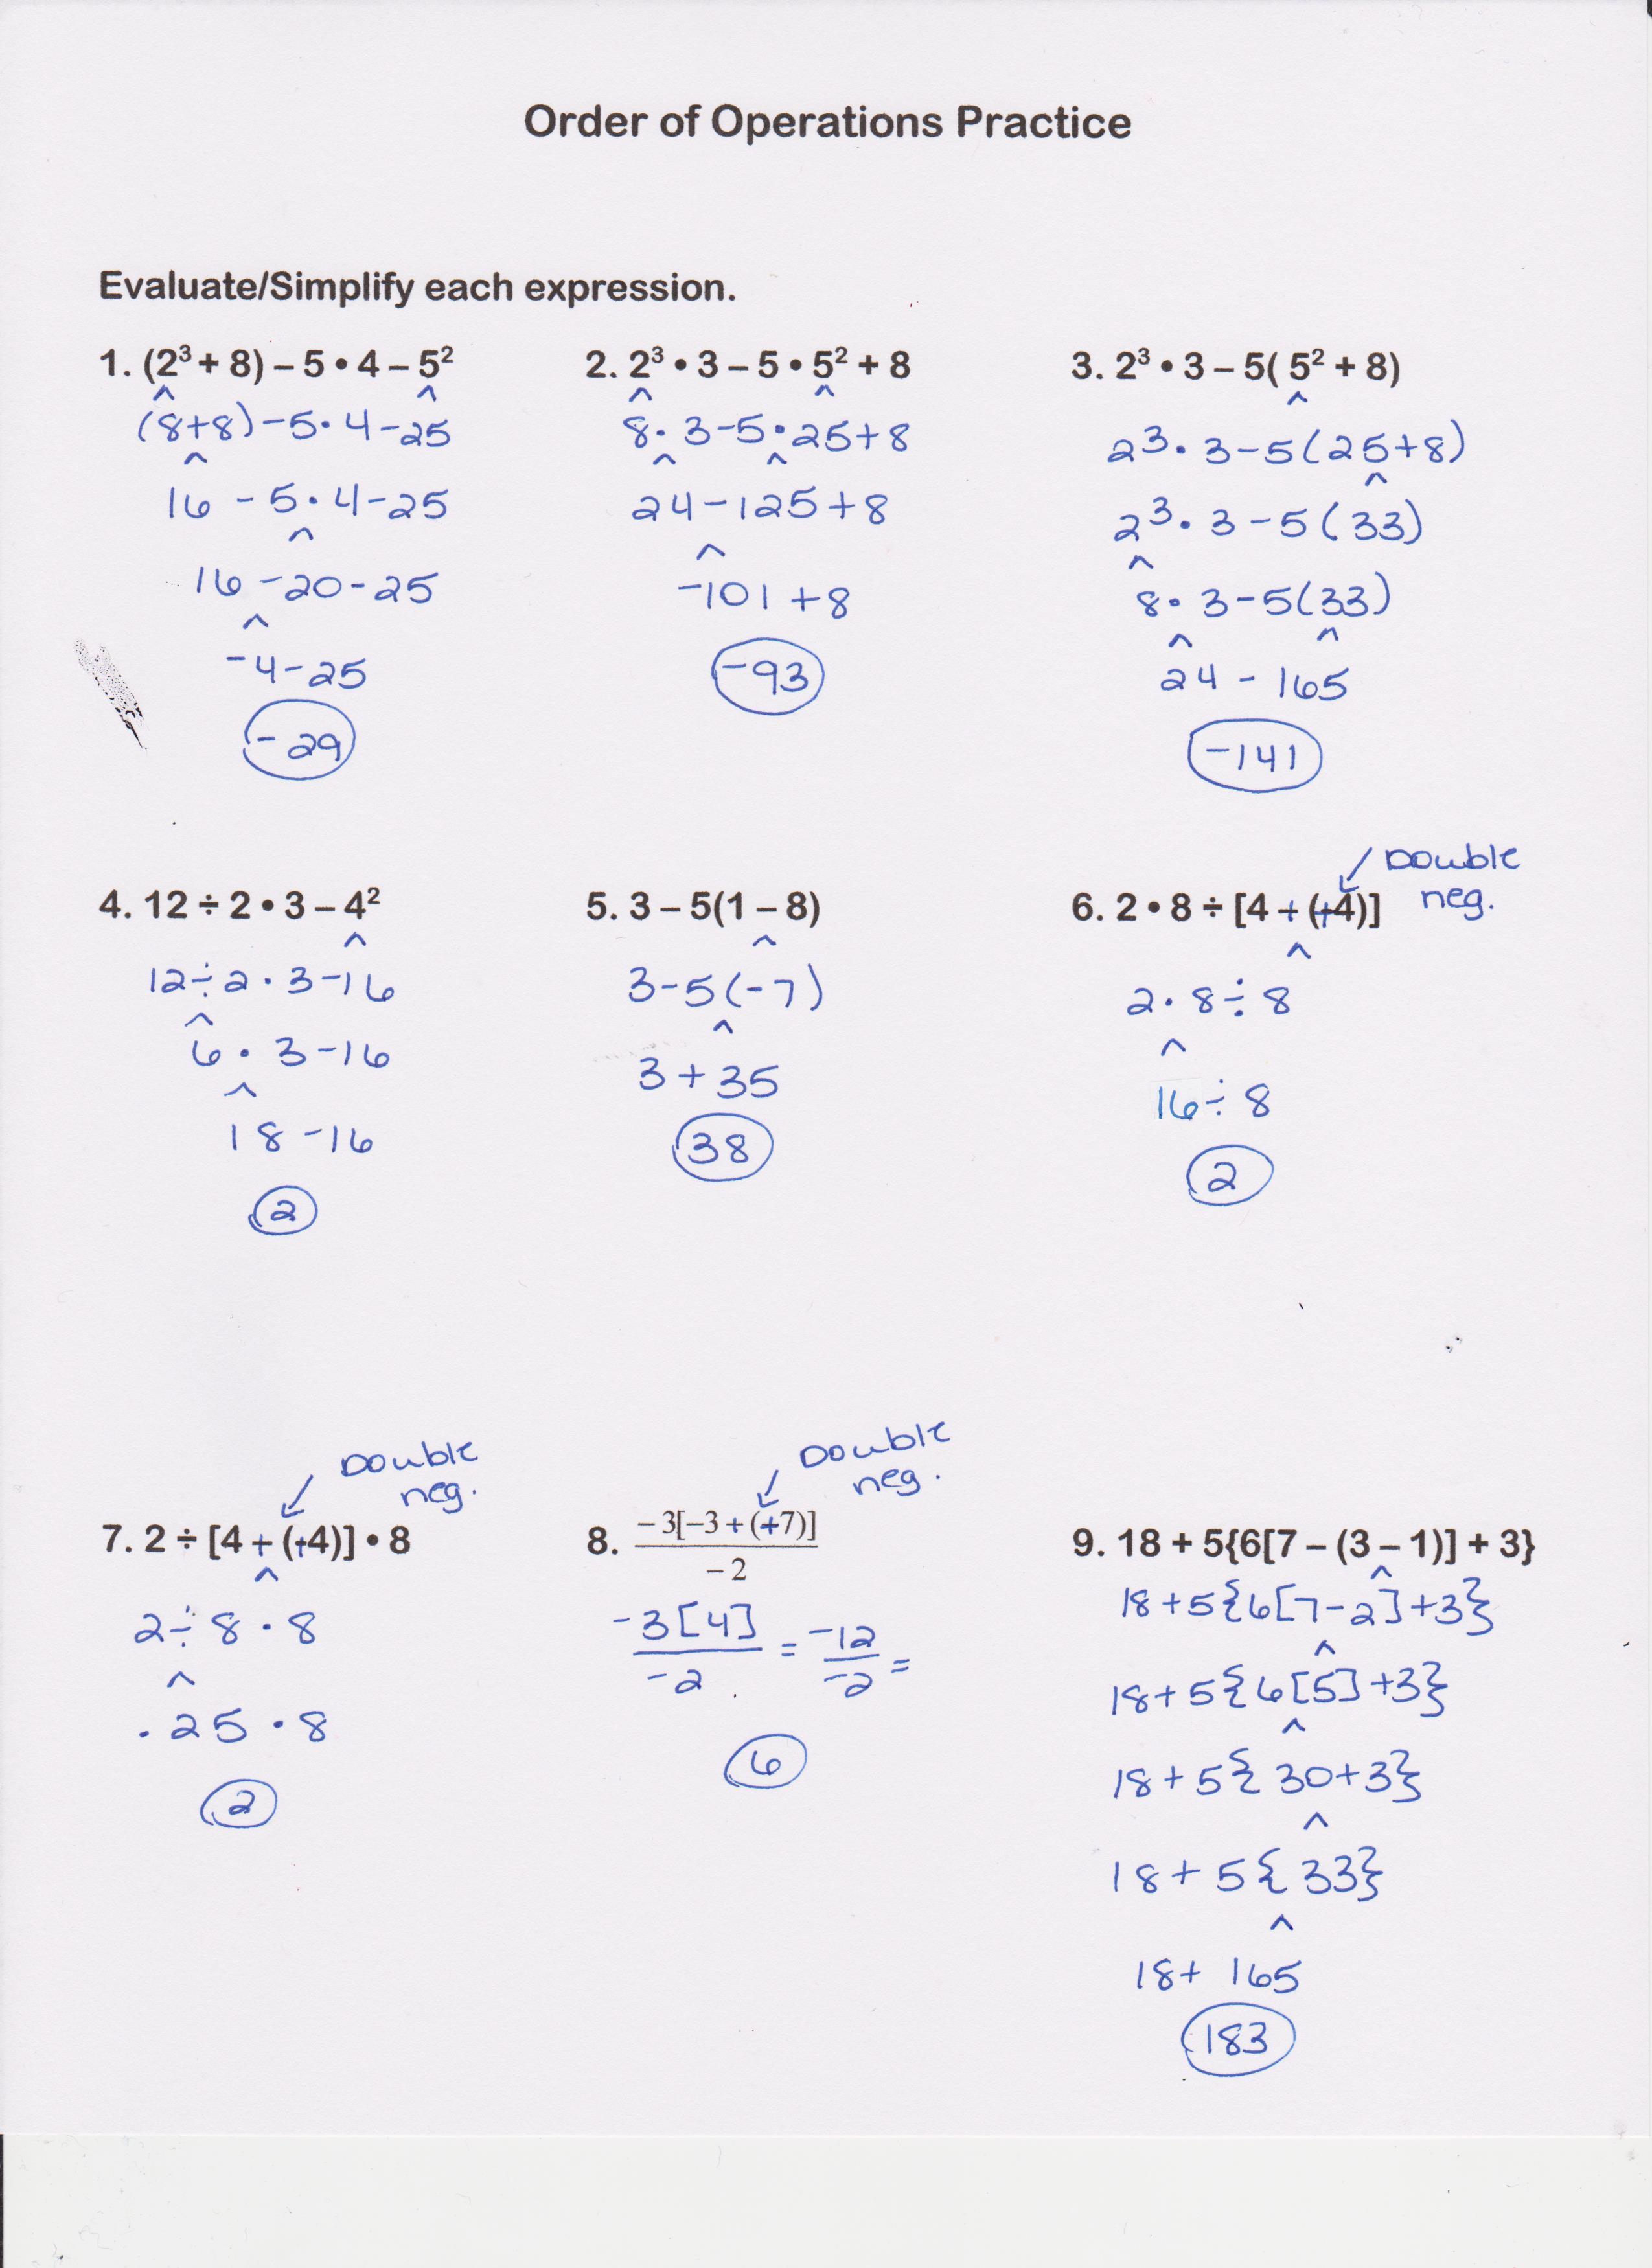 Liveperson homework help